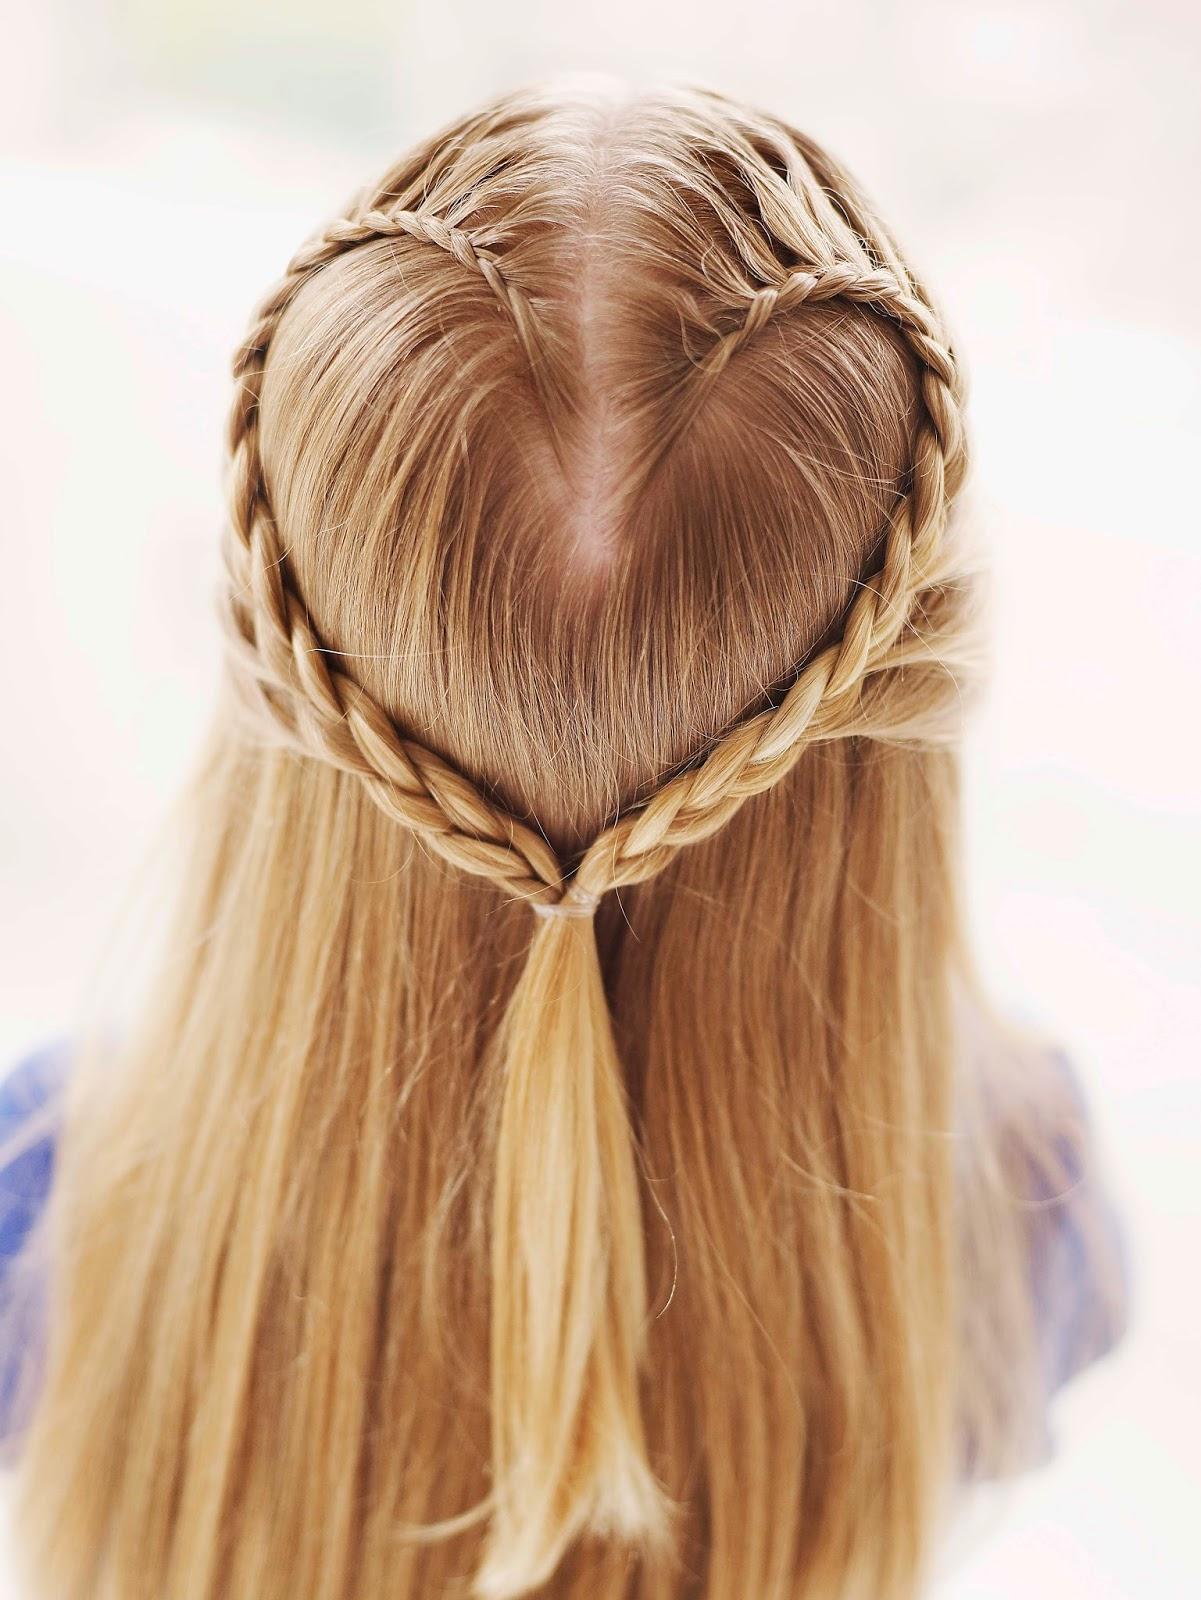 Pleasant Hairstyles For Long Hair Tumblr For Women Hair Fashion Style Short Hairstyles For Black Women Fulllsitofus